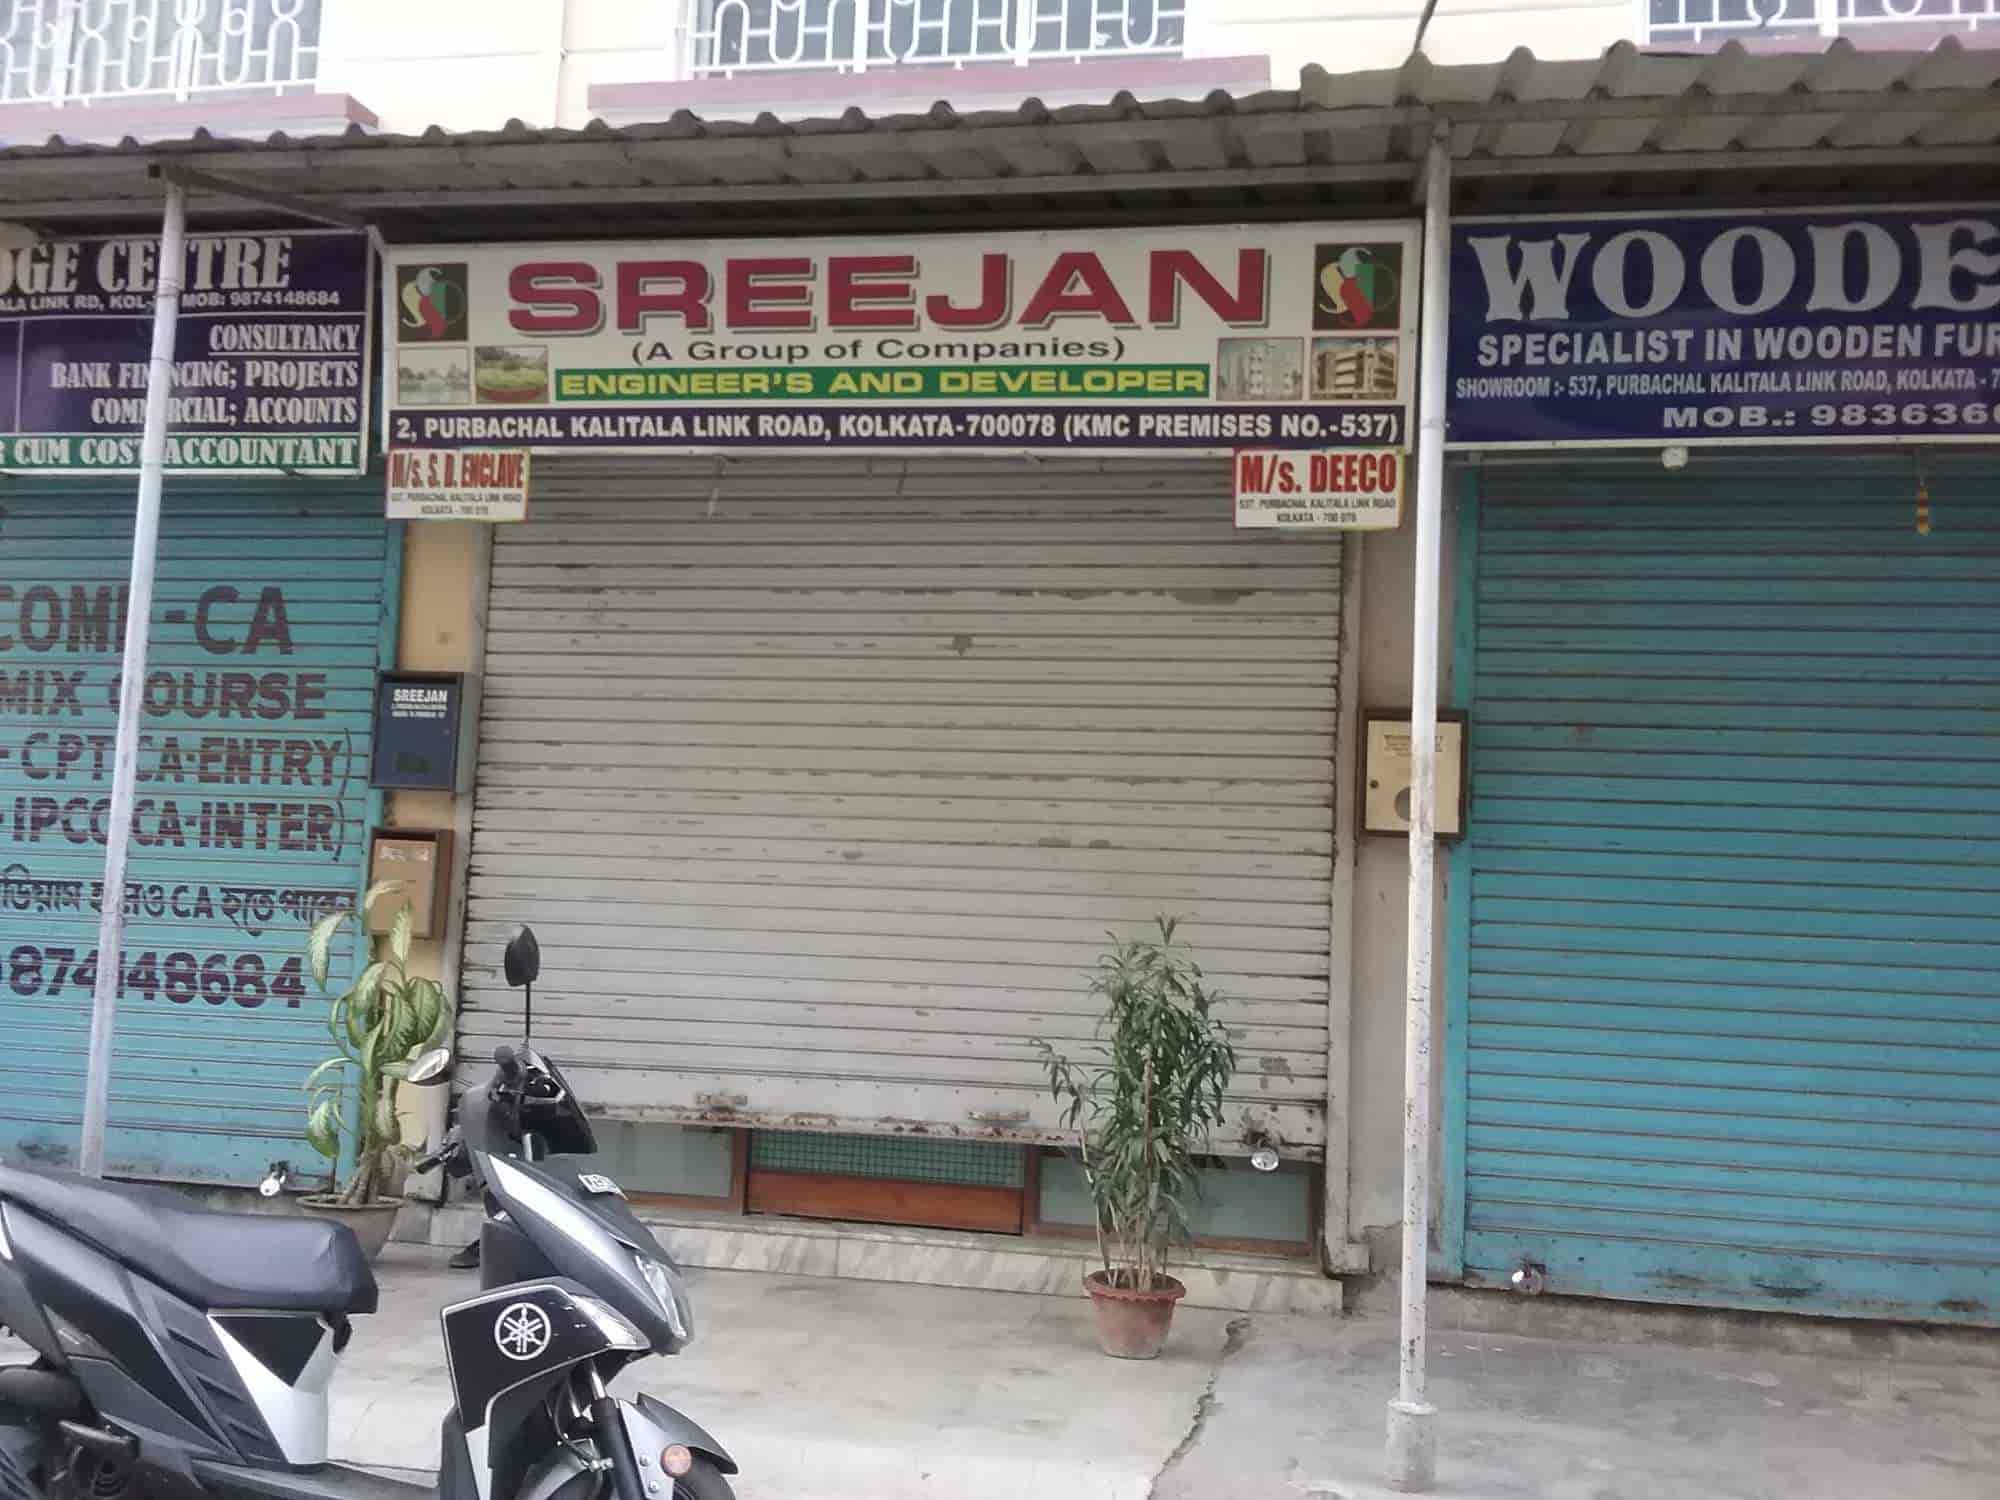 Sreejan Developer Civil Engineer, Kalikapur - Builders